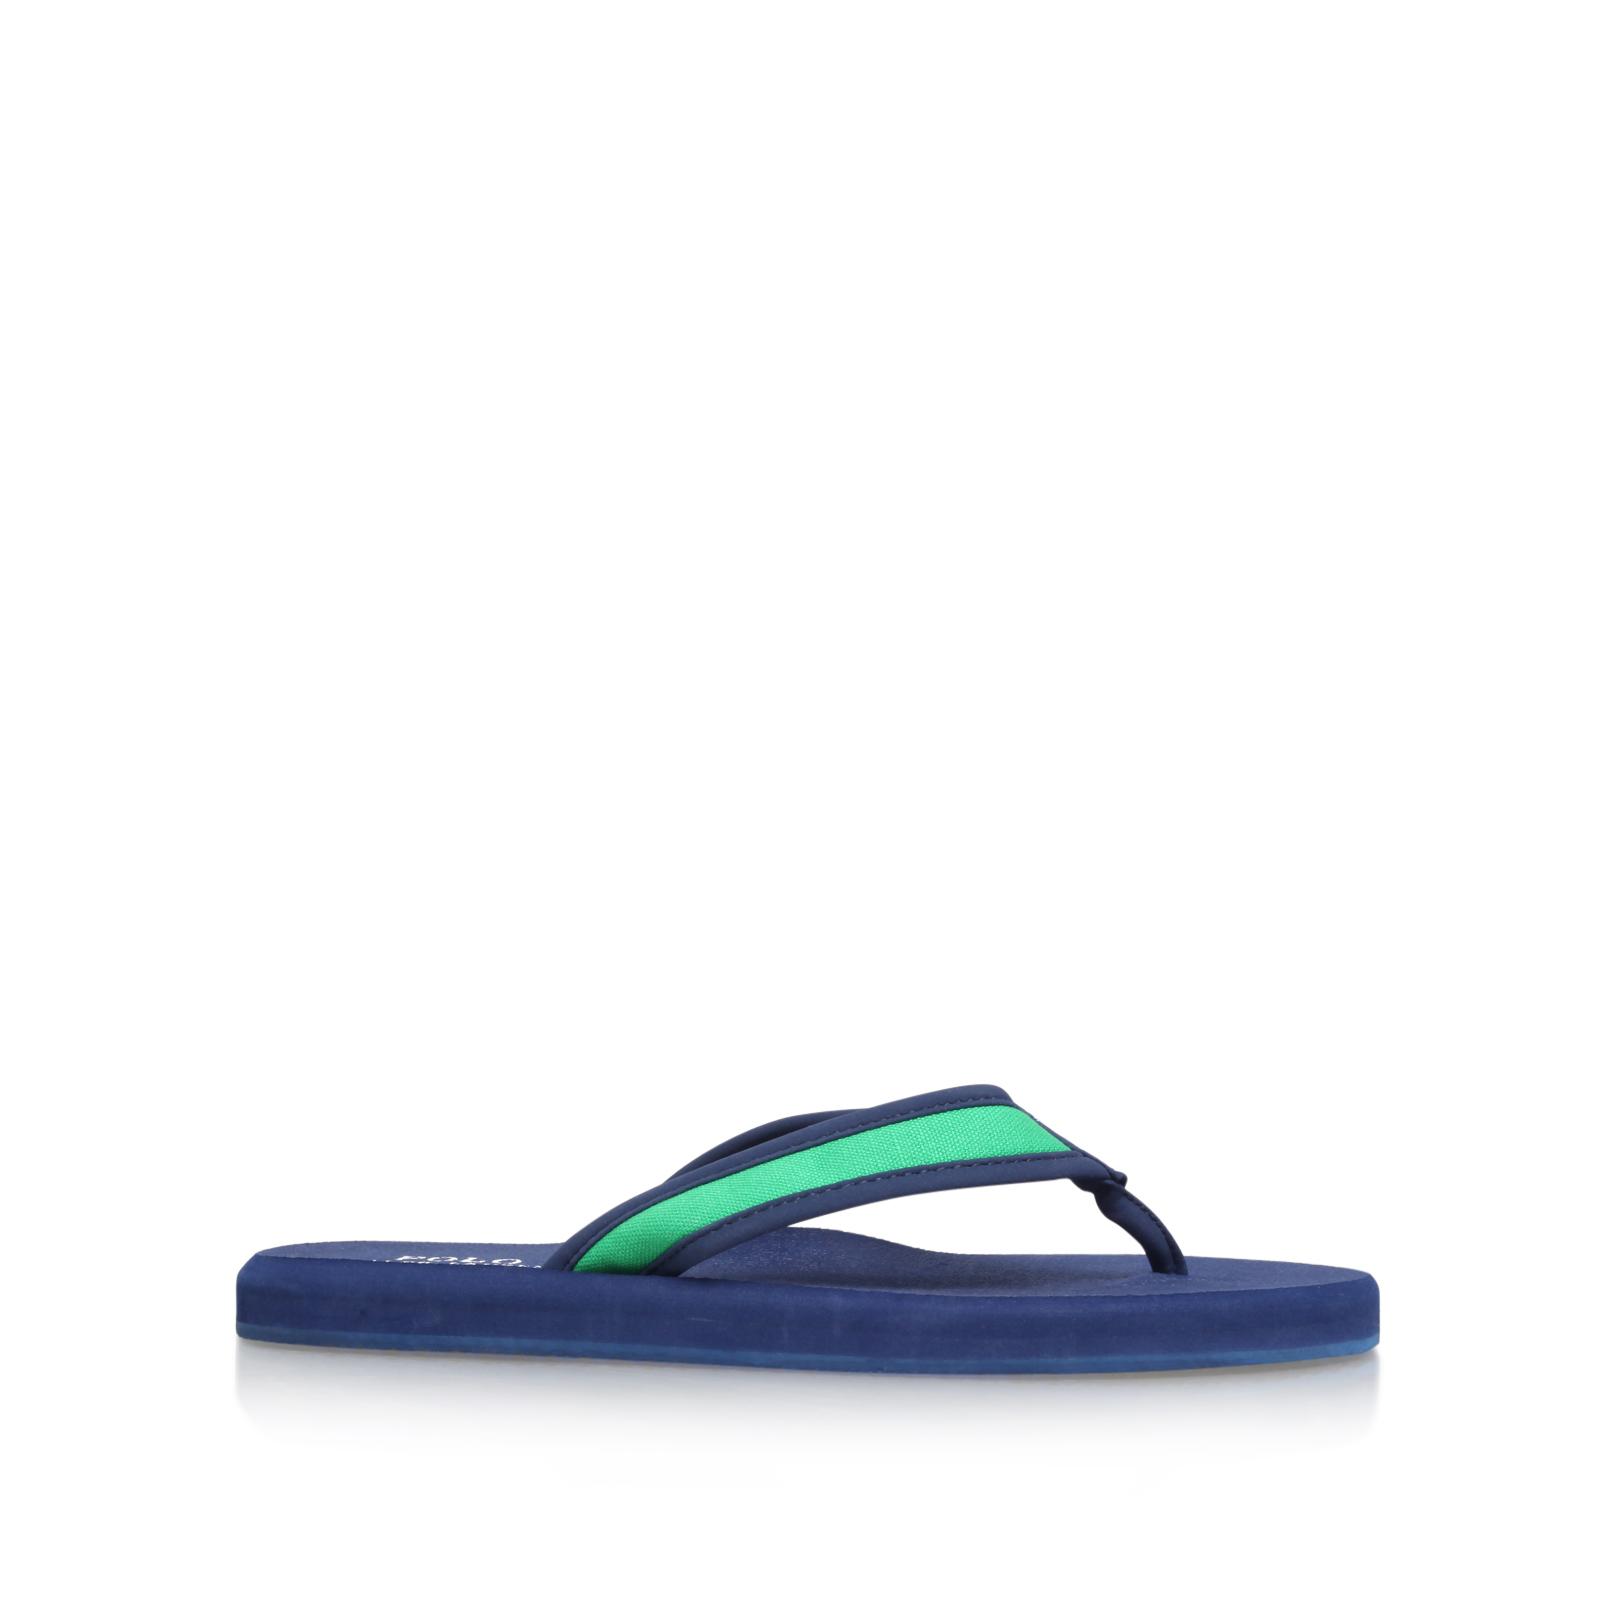 0fde78d1fa4e7 ALMER II FLIP FLOP Polo Rl Almer Ii Flip Flop Blue Flat Sandals by POLO  RALPH LAUREN